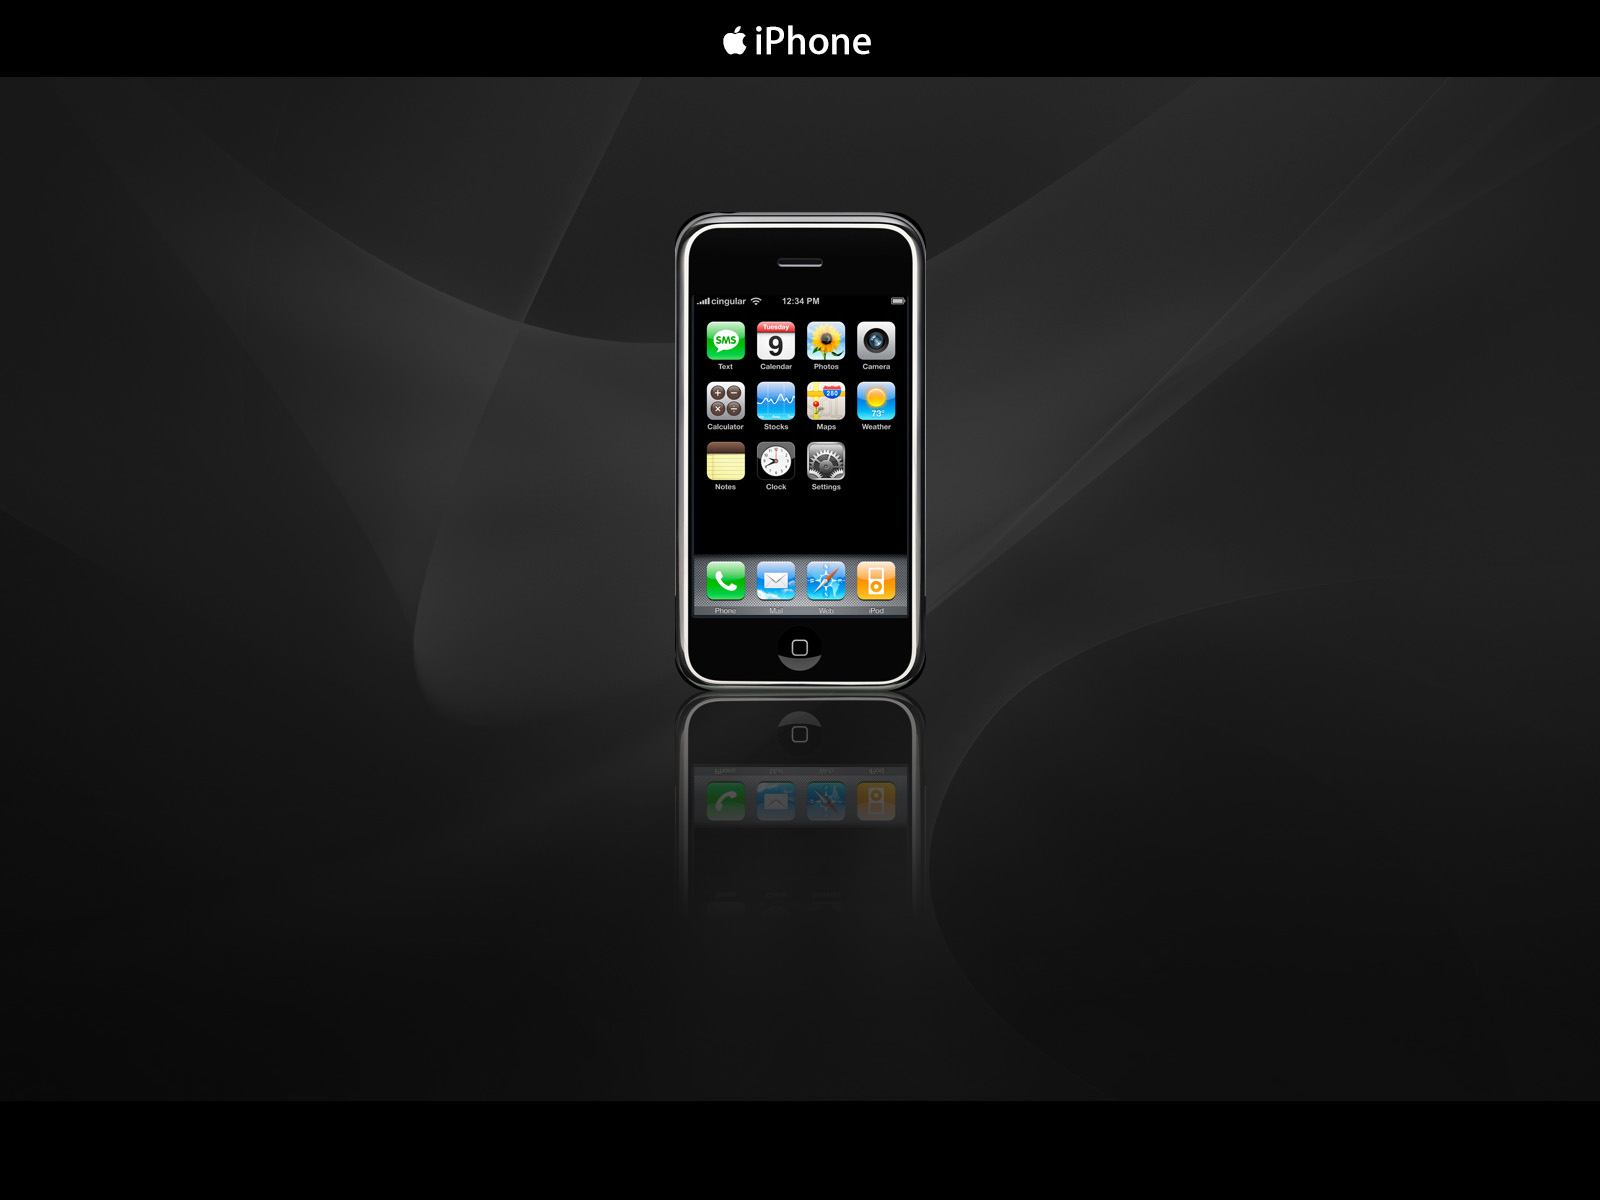 Black Wallpaper Hd Iphone 5 11 Free Hd Wallpaper